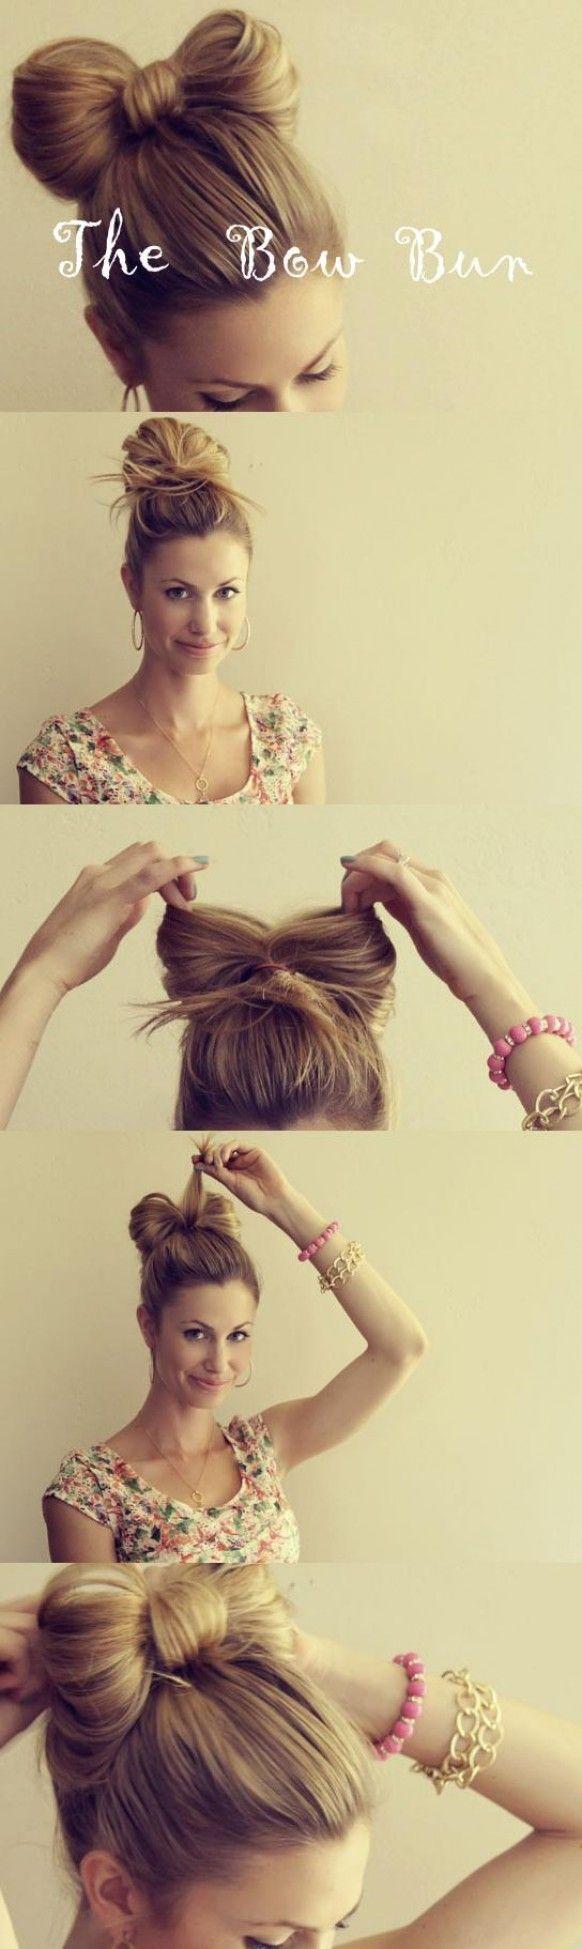 DIY hair bow bun tutorial ♥ Gorgeous // I wanna figure out how to do this so badly!